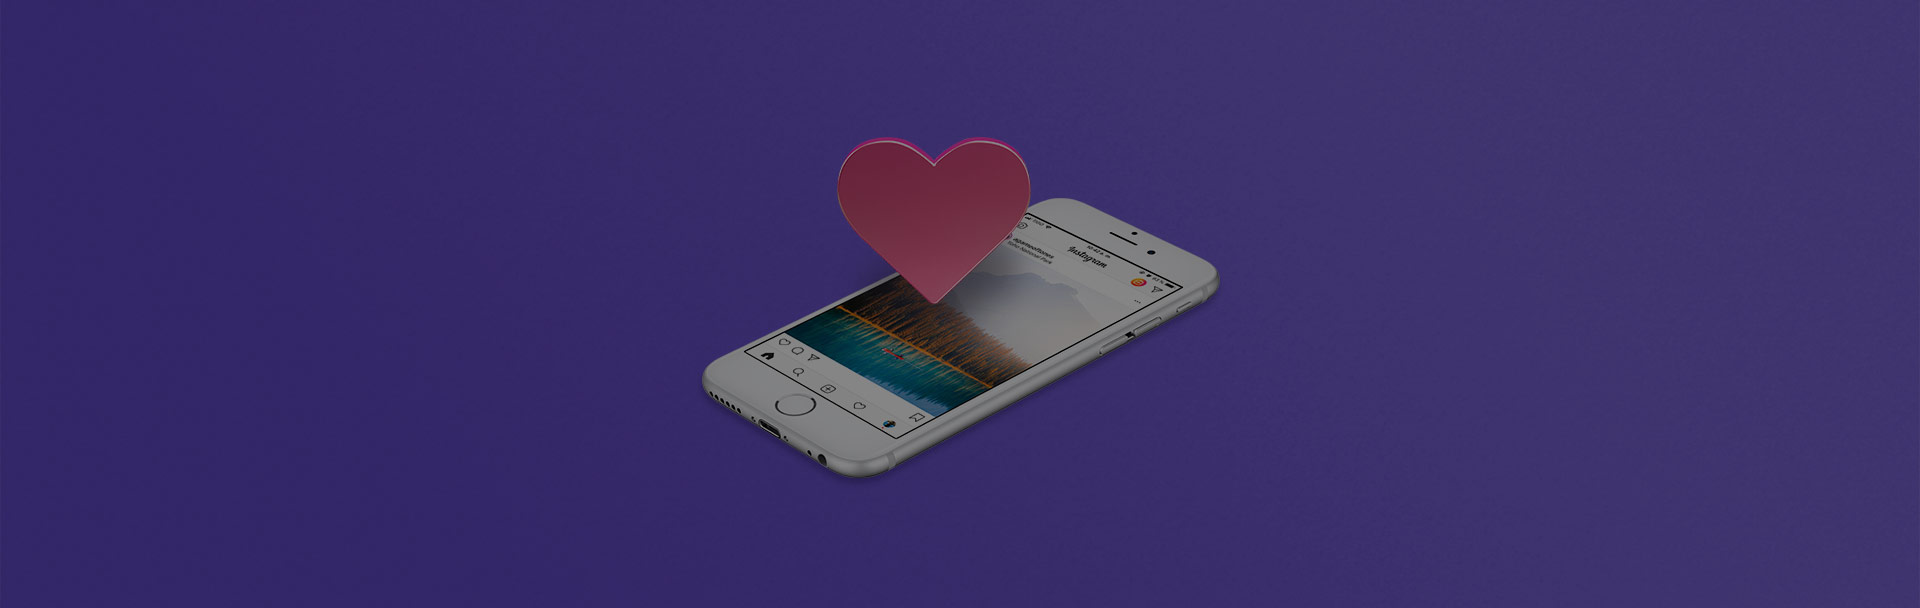 solucionweb-banner-blog-estrategia-digital-inbound-redes-sociales-blog-algoritmo-instagram.jpg